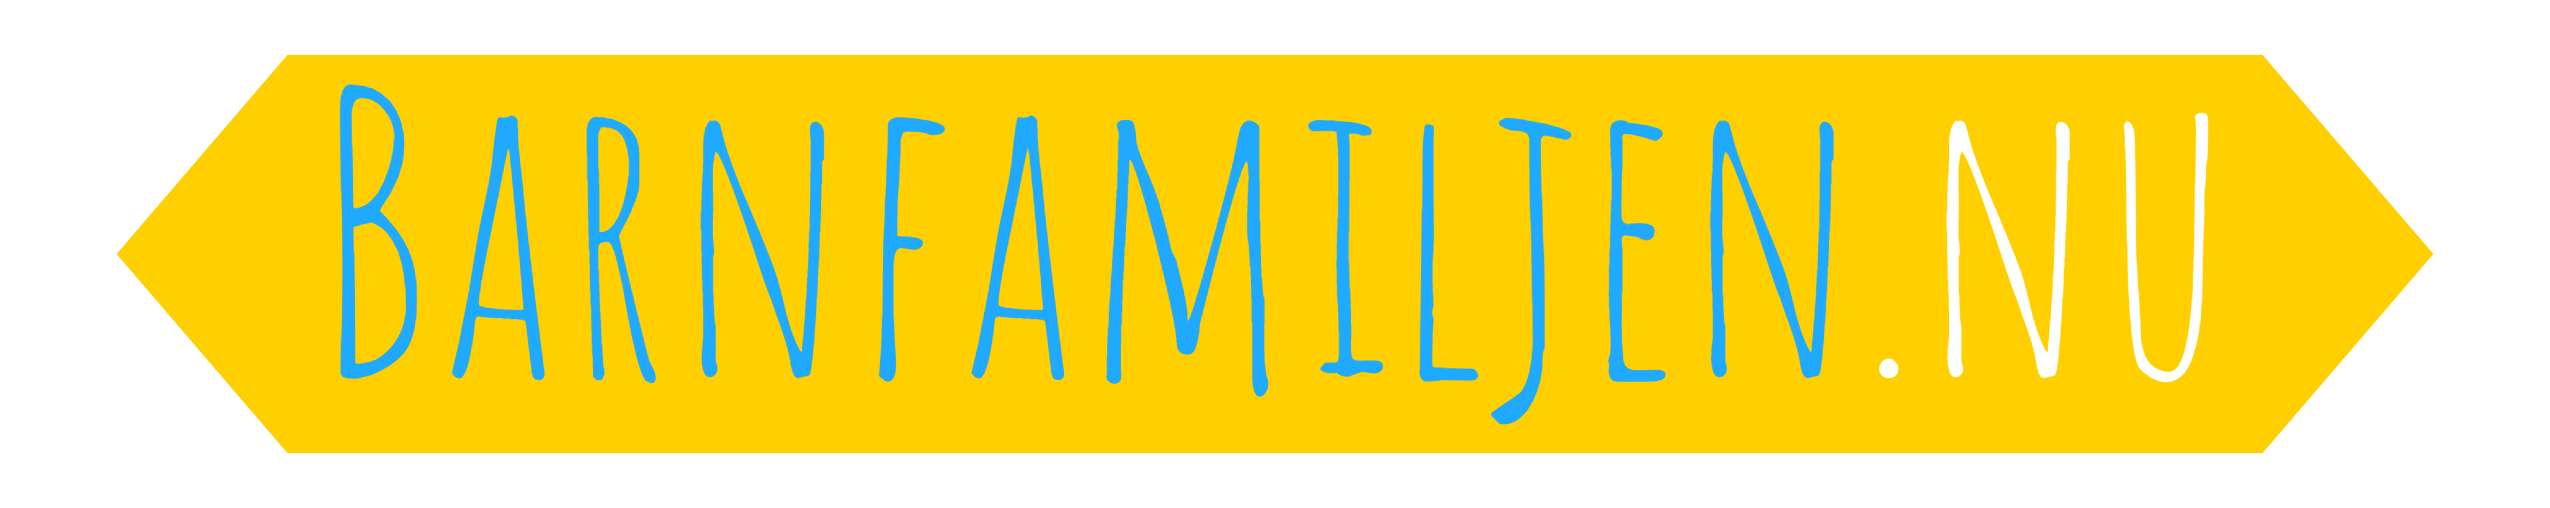 Barnfamiljen